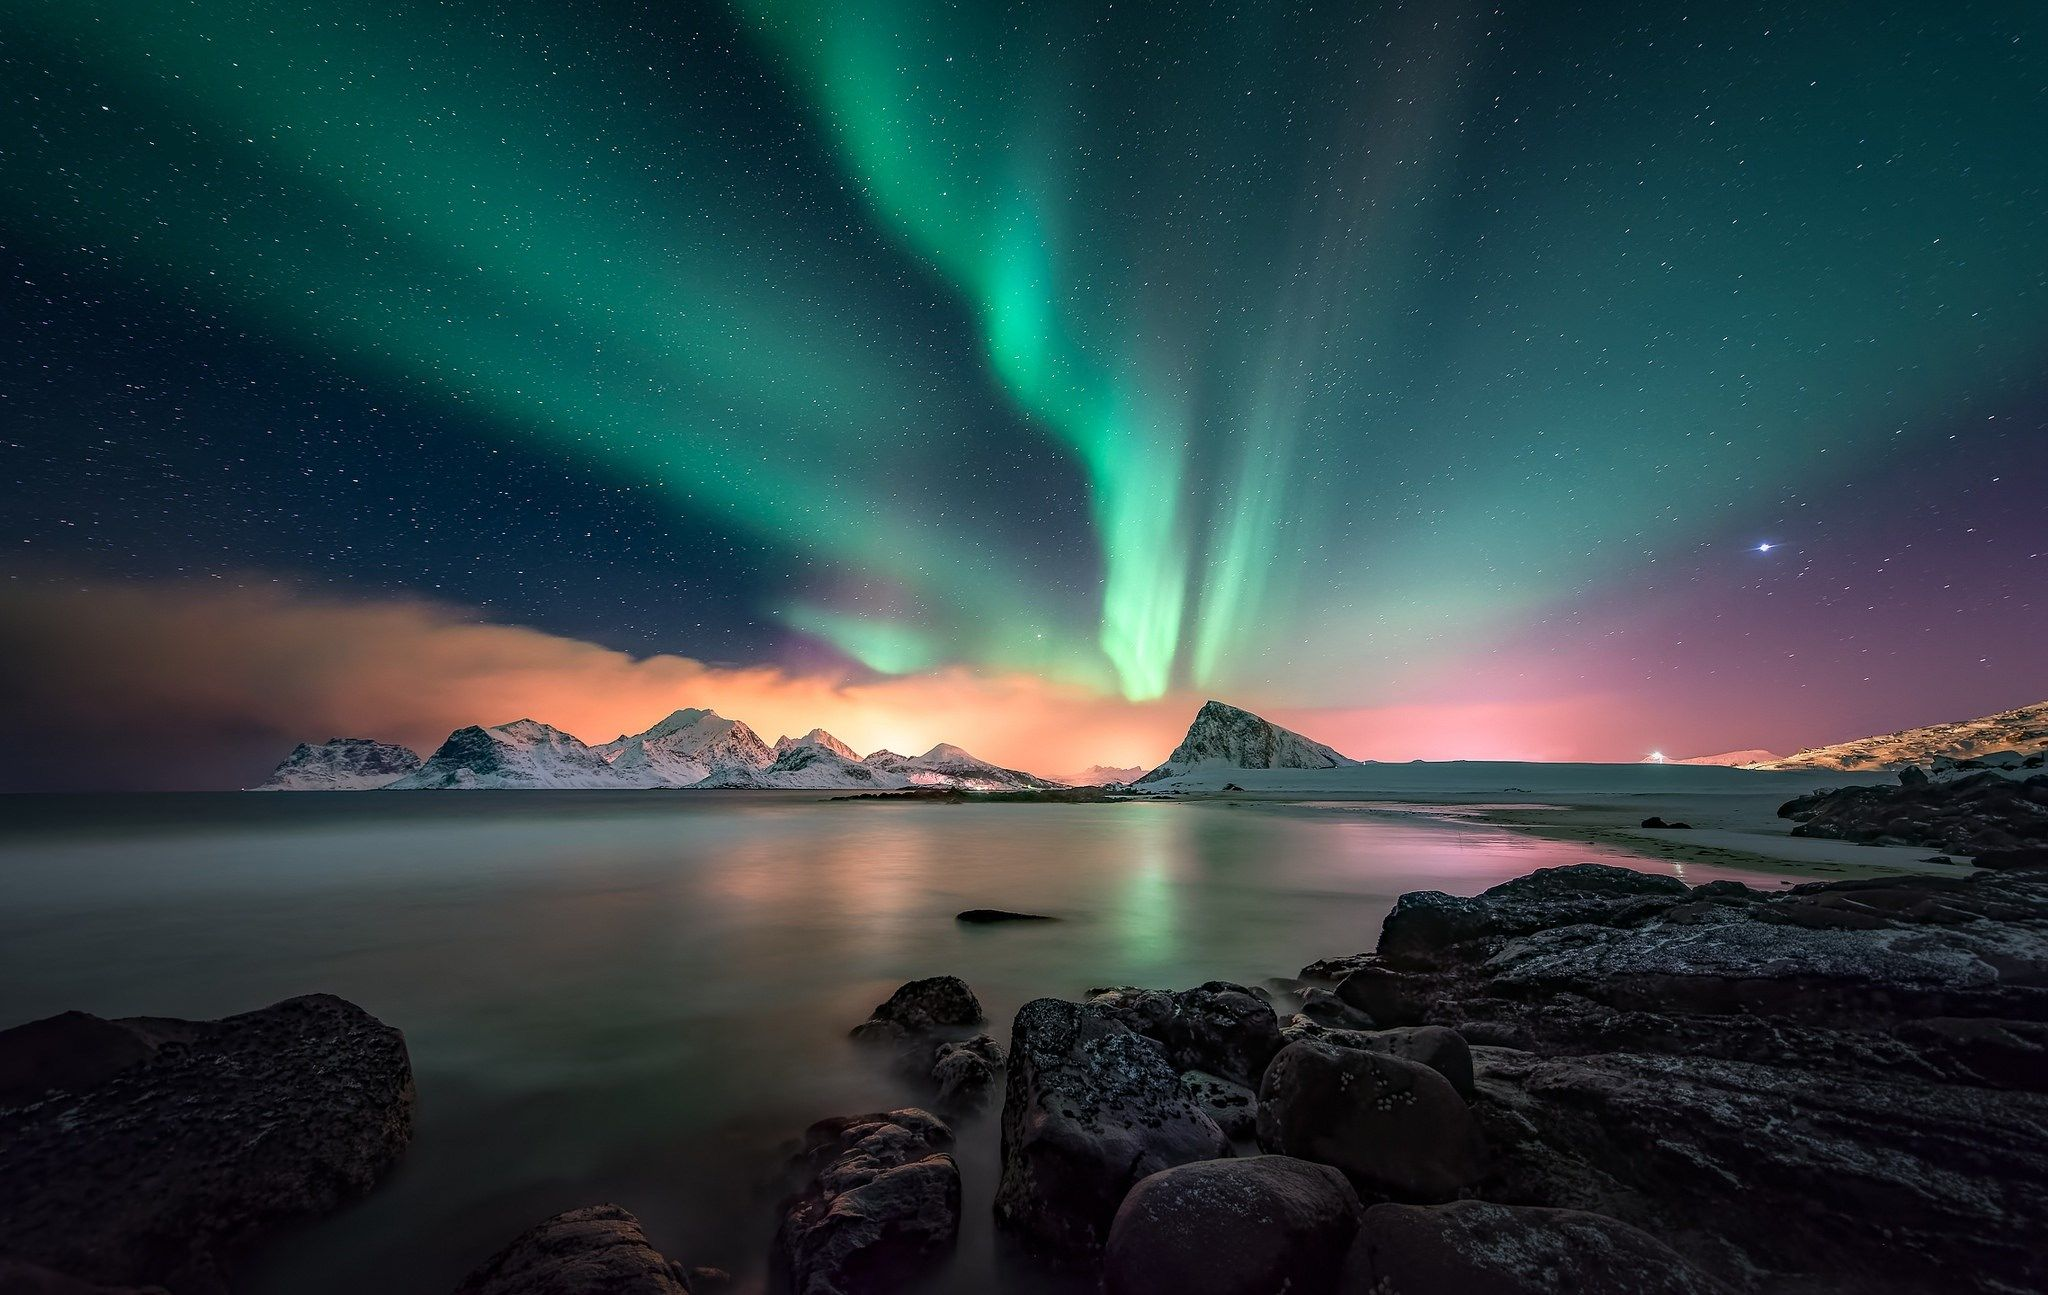 aurora borealis wallpaper free, kurtis ross 2017-03-17 | gogolmogol